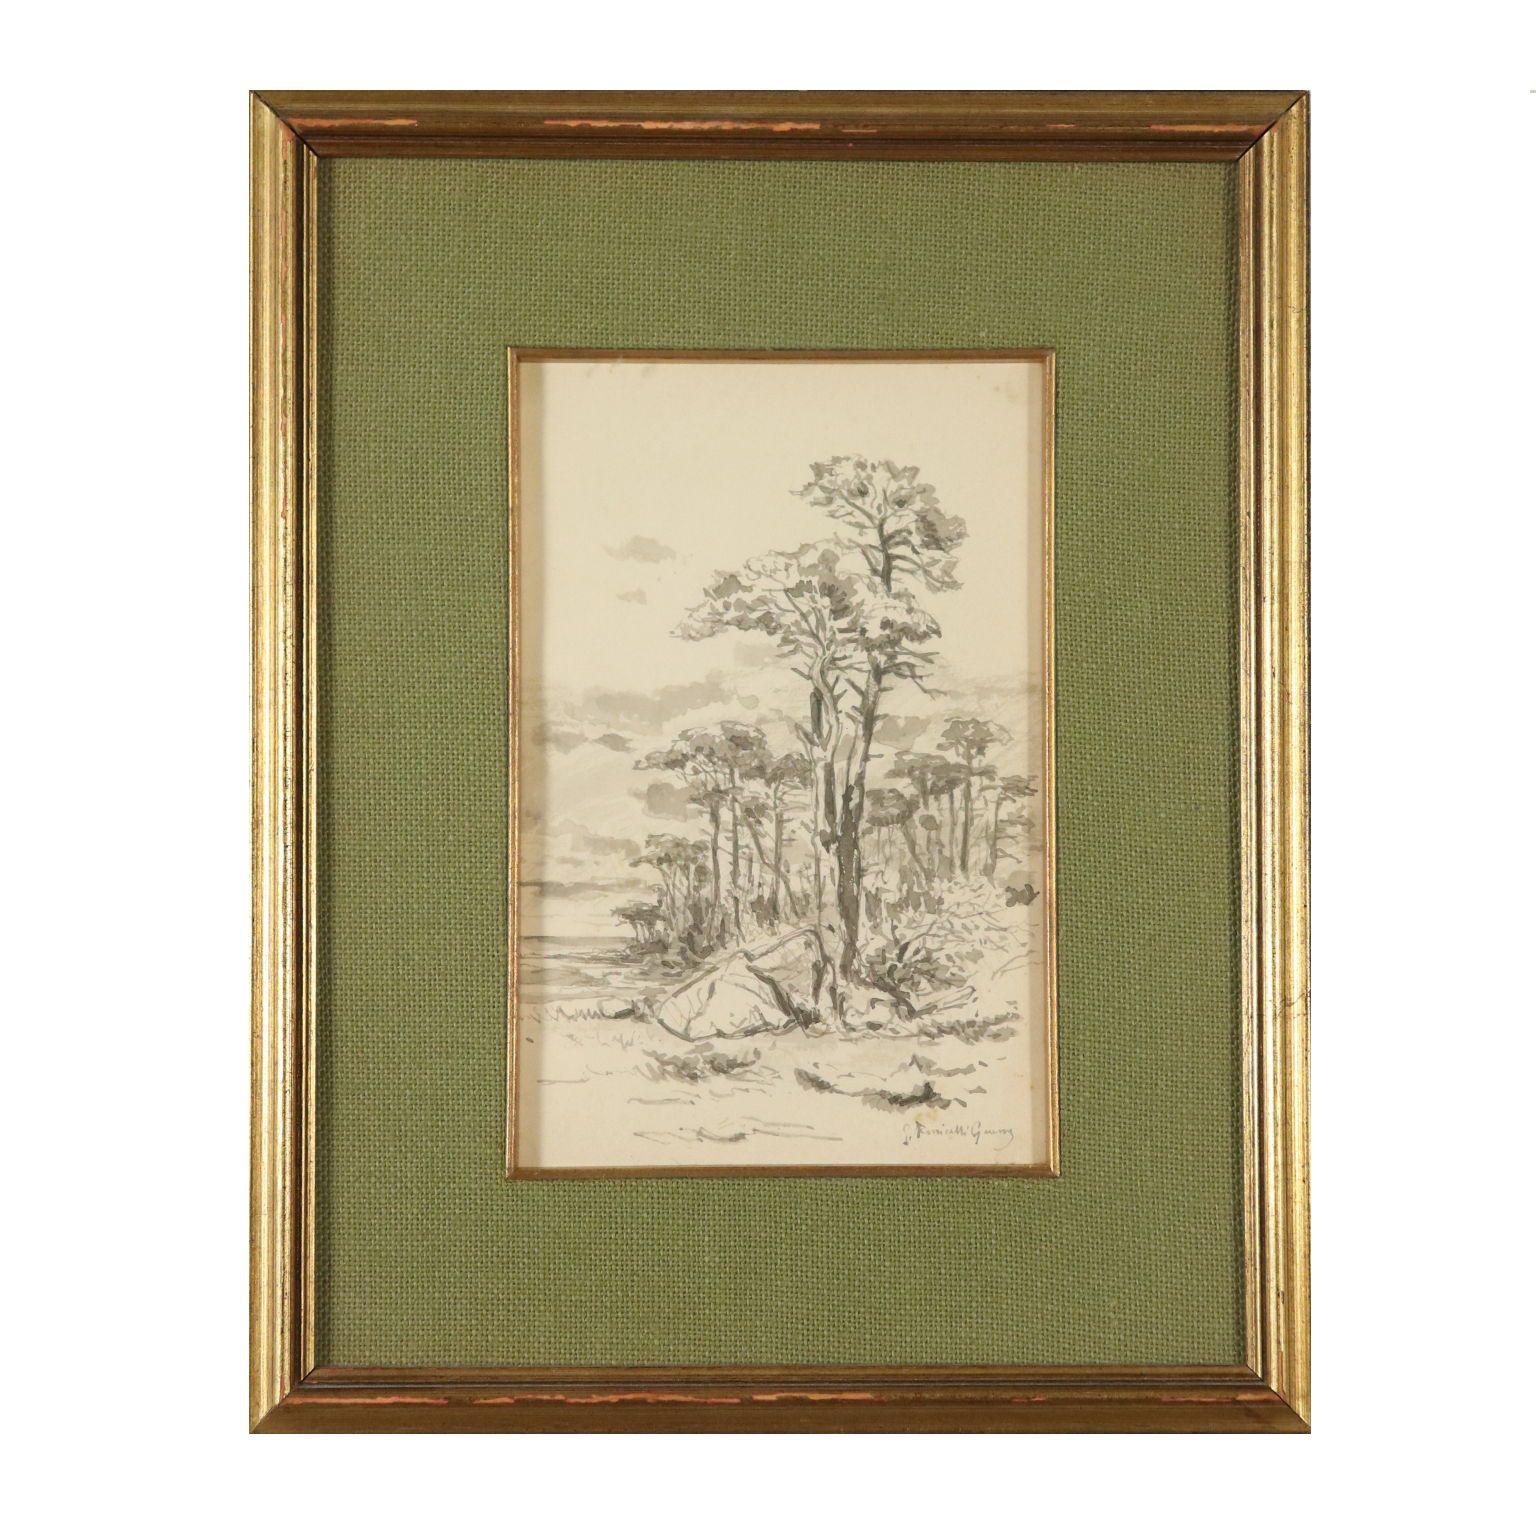 Photo of Aquarell von Giuseppe Puricelli Guerra Landschaft 19. Jahrhundert